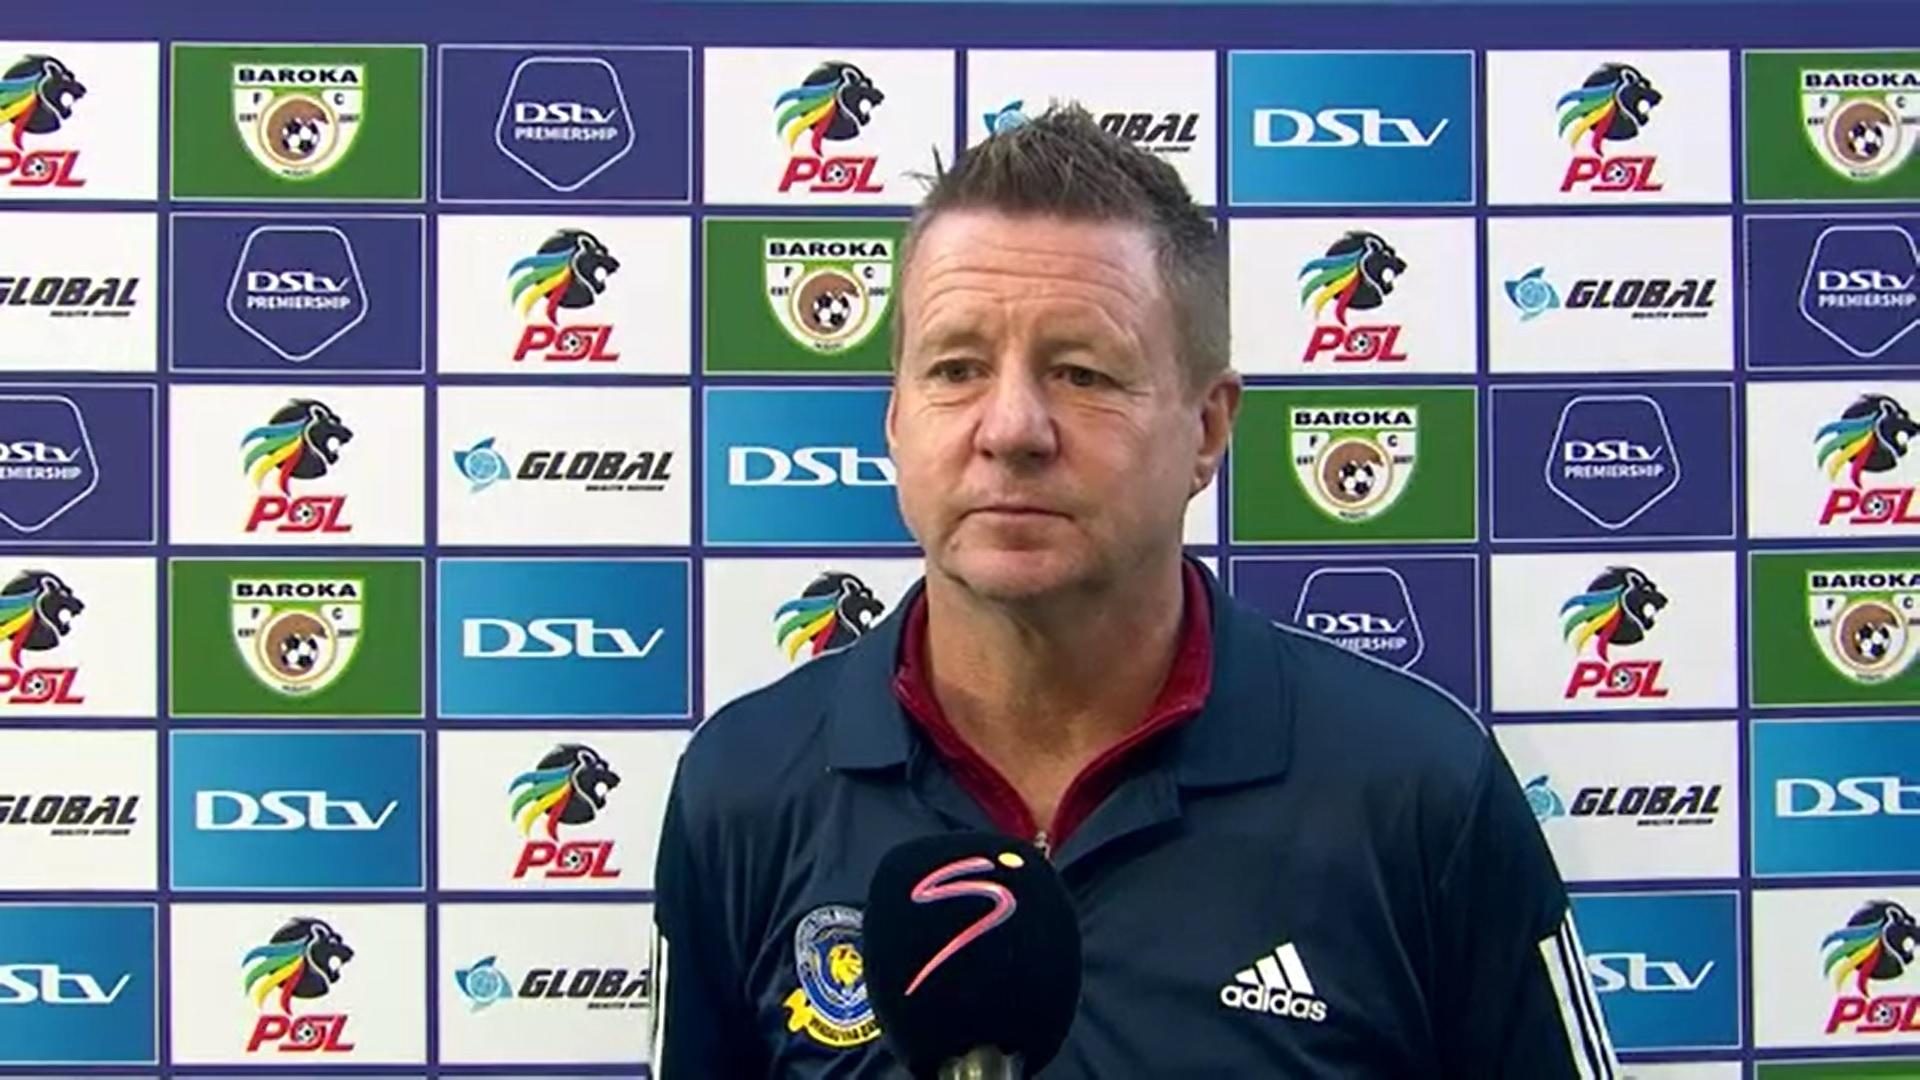 DStv Premiership | Baroka FC v Tshakhuma FC | Post-match interview with Dylan Kerr